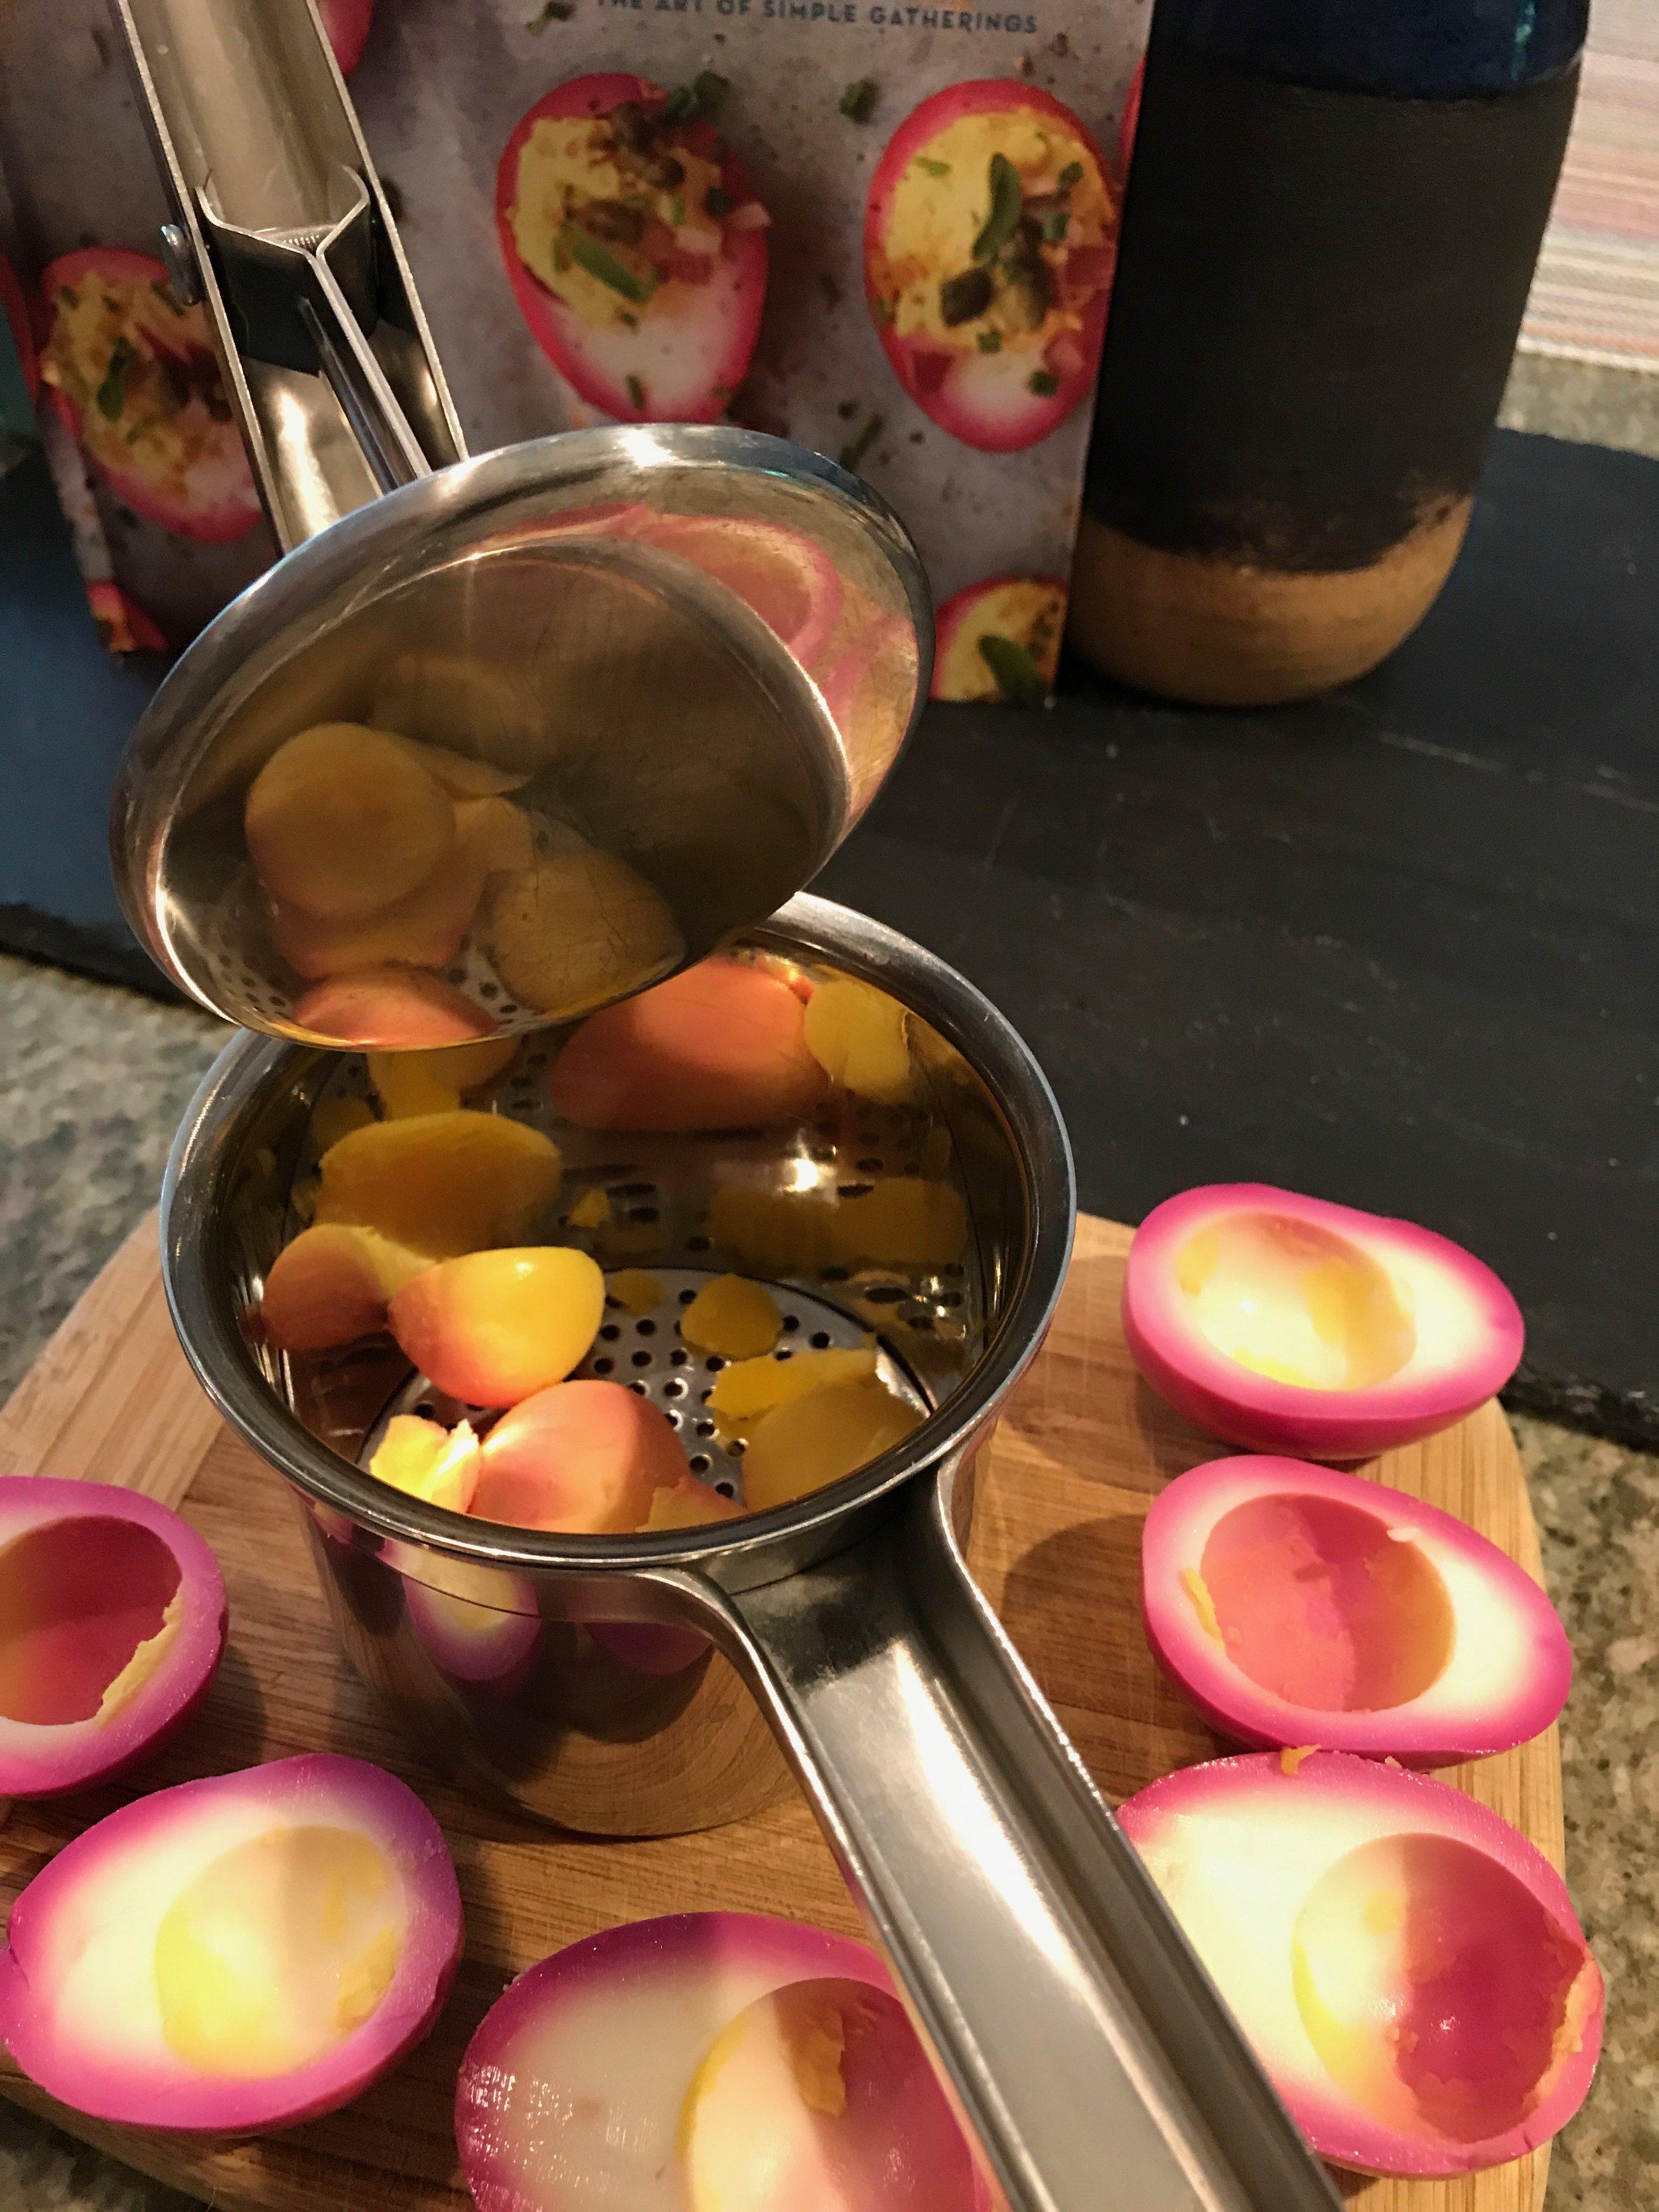 Mash Yolks! - I love using my potato ricer to mash my yolks - gives a smooth texture!